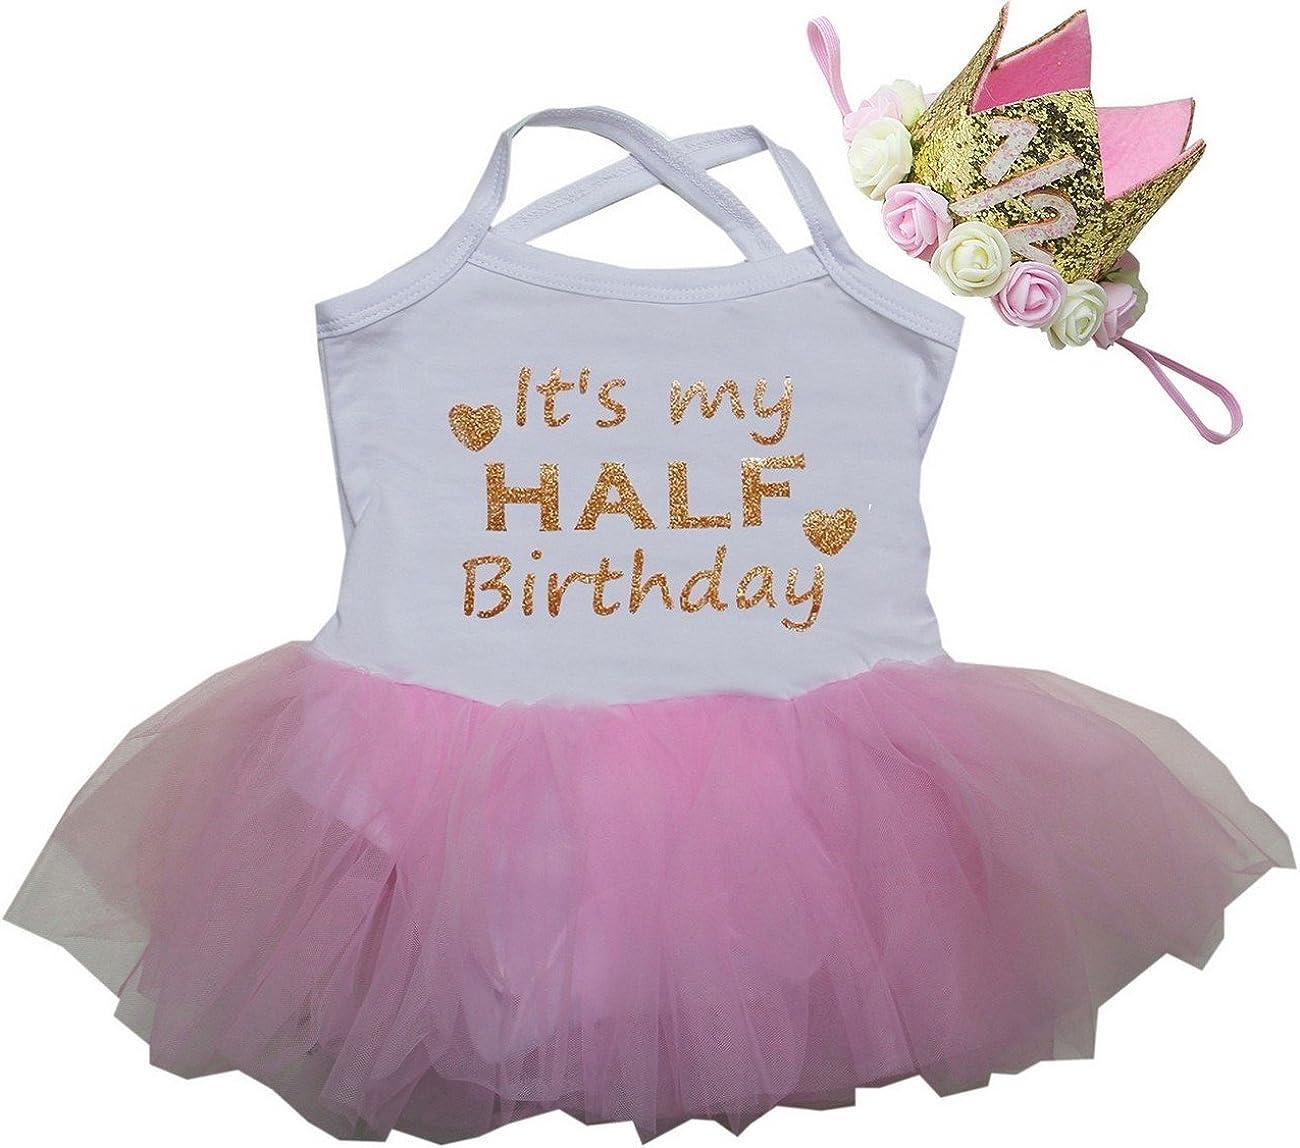 Many popular brands Kirei Sui Baby Super-cheap Half Birthday Tulle Crow Gold 2 1 Bodysuit Tutu